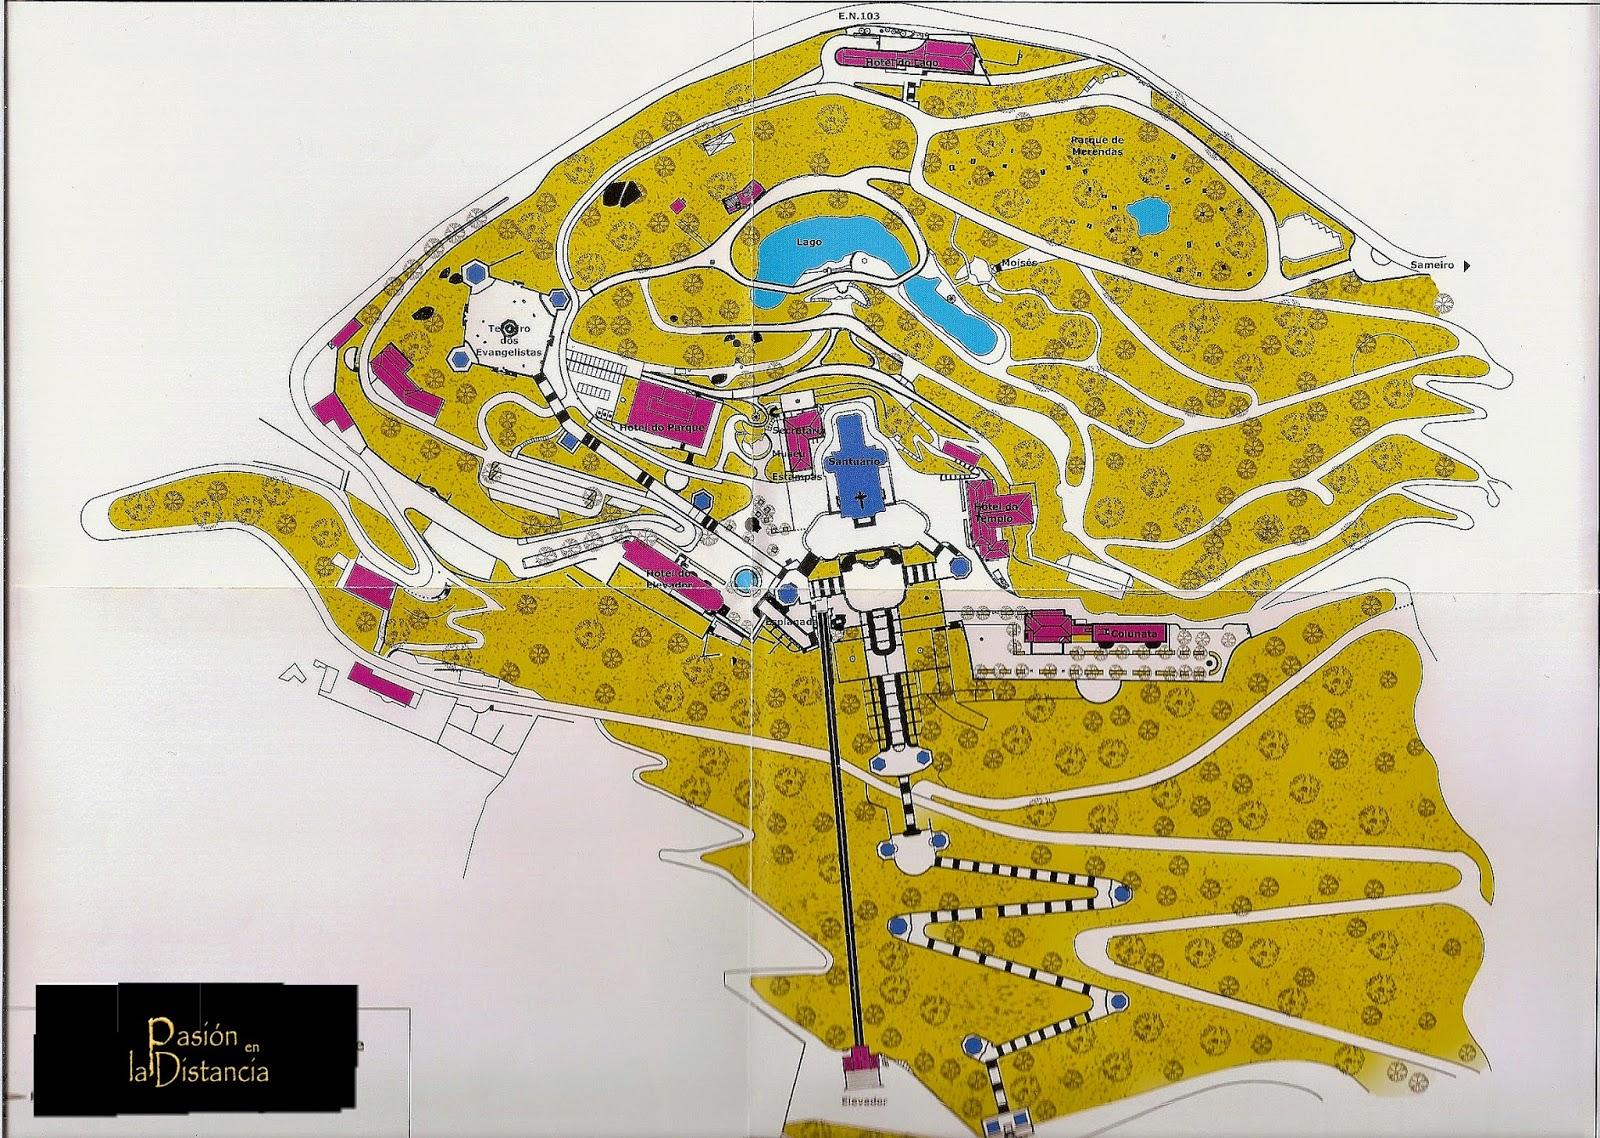 Plano completo del Bom Jesú do Monte - Braga